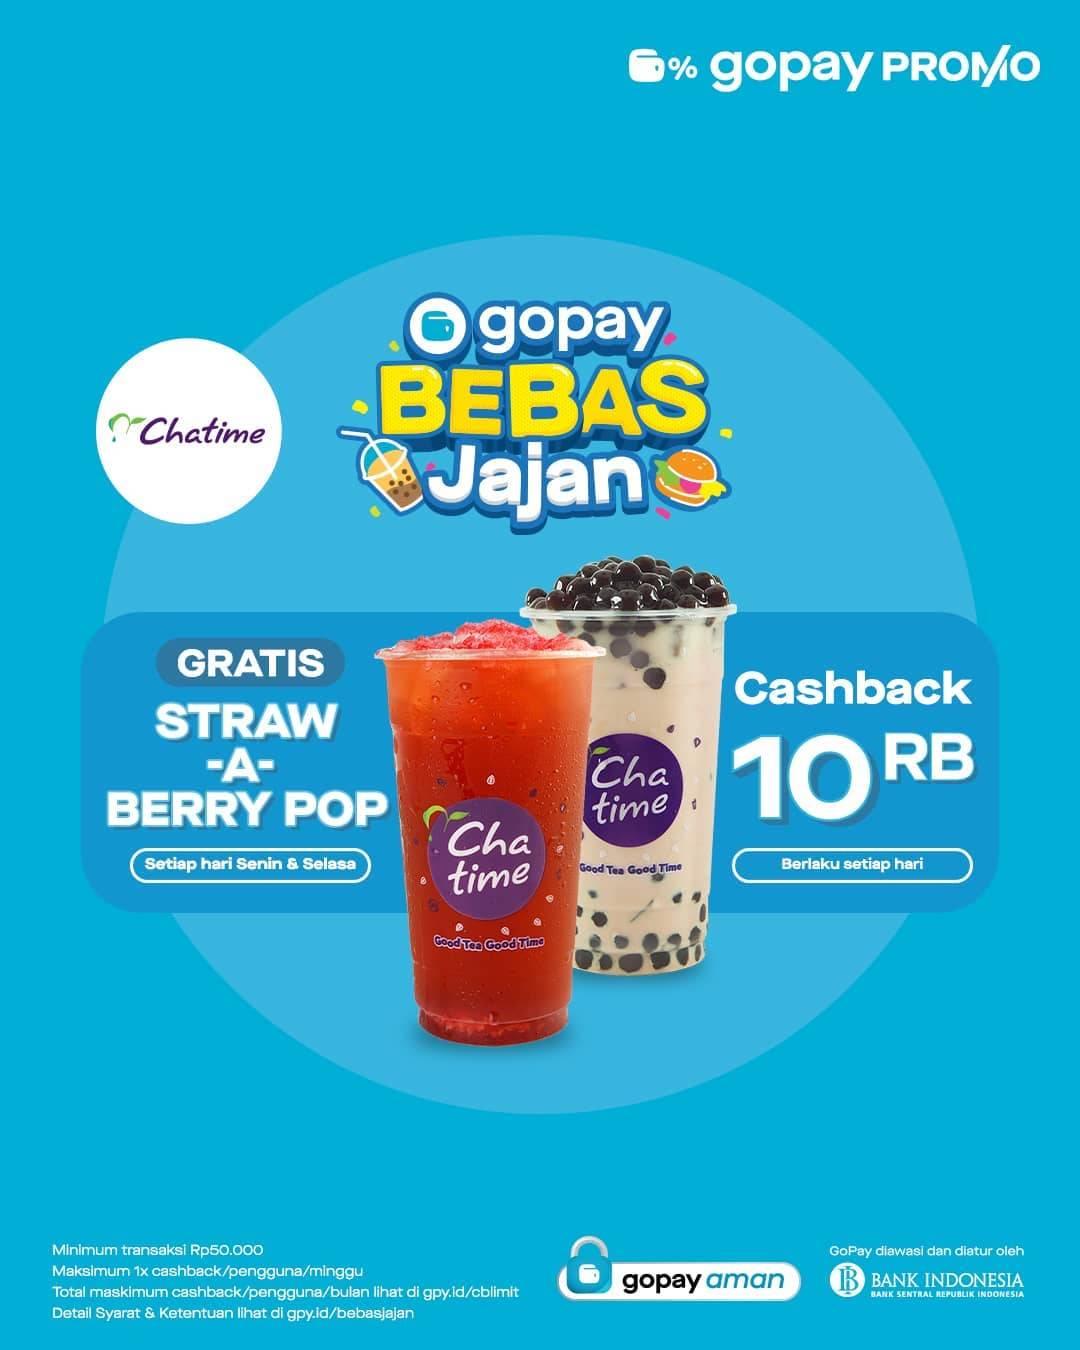 Diskon Chatime Promo Gratis Strawberry Pop Atau Cashback Rp. 10.000 Dengan Gopay